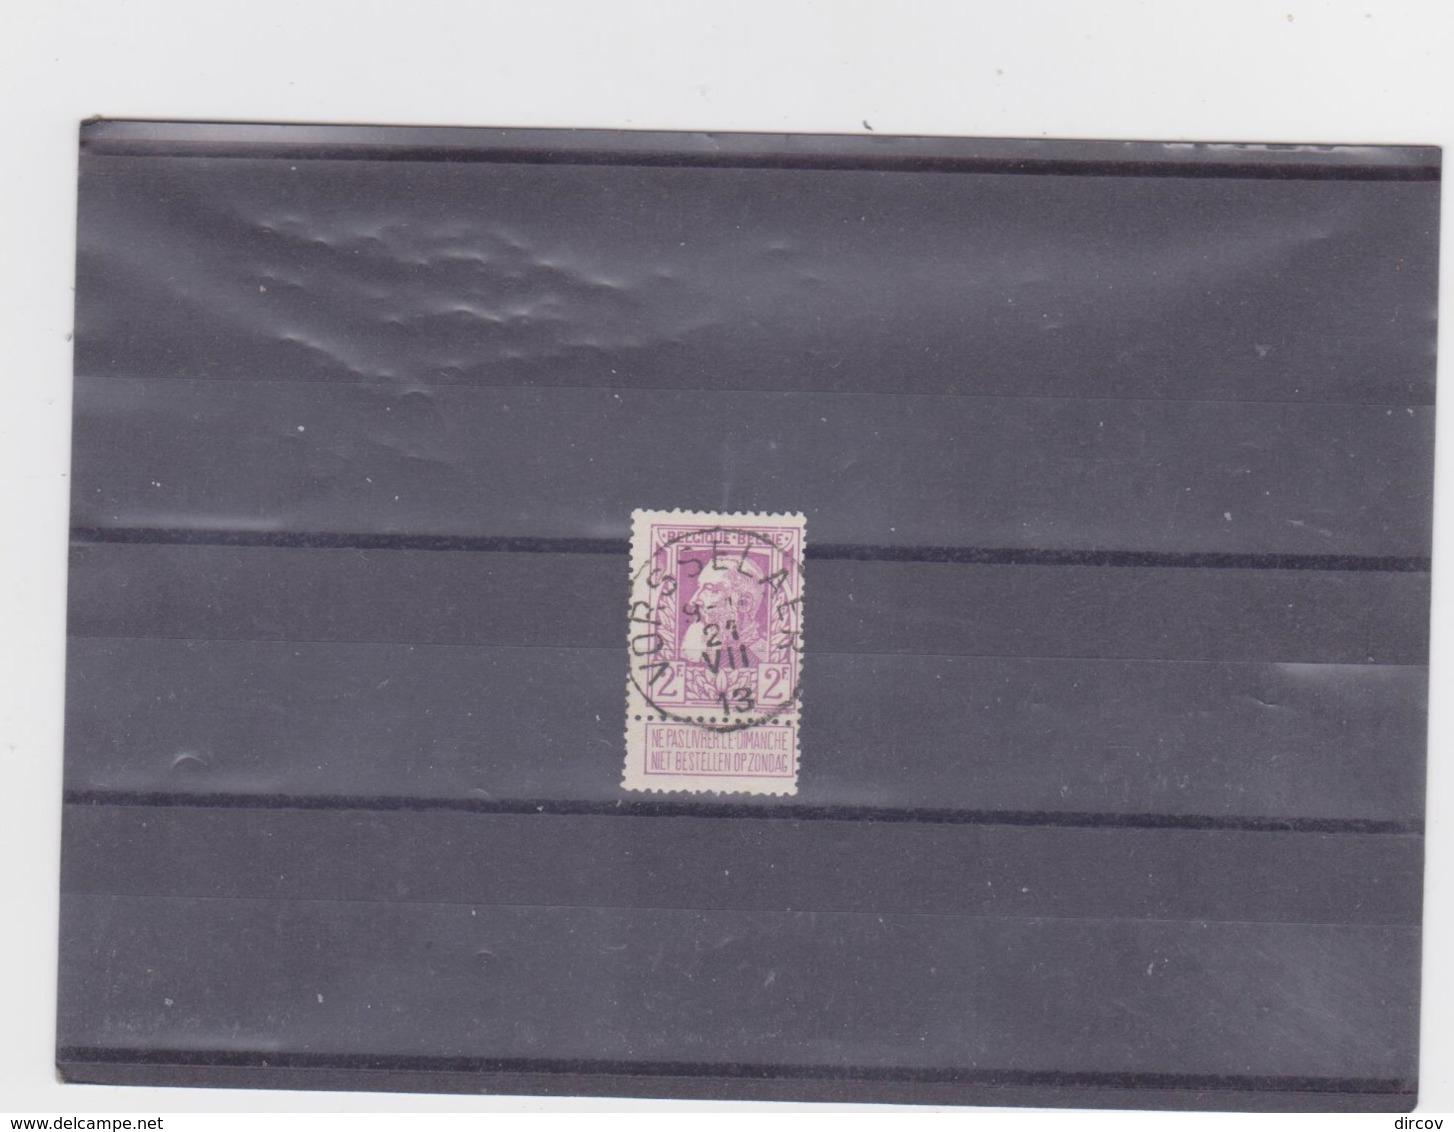 Belgie Nr 80 Vorsselaer - 1905 Breiter Bart